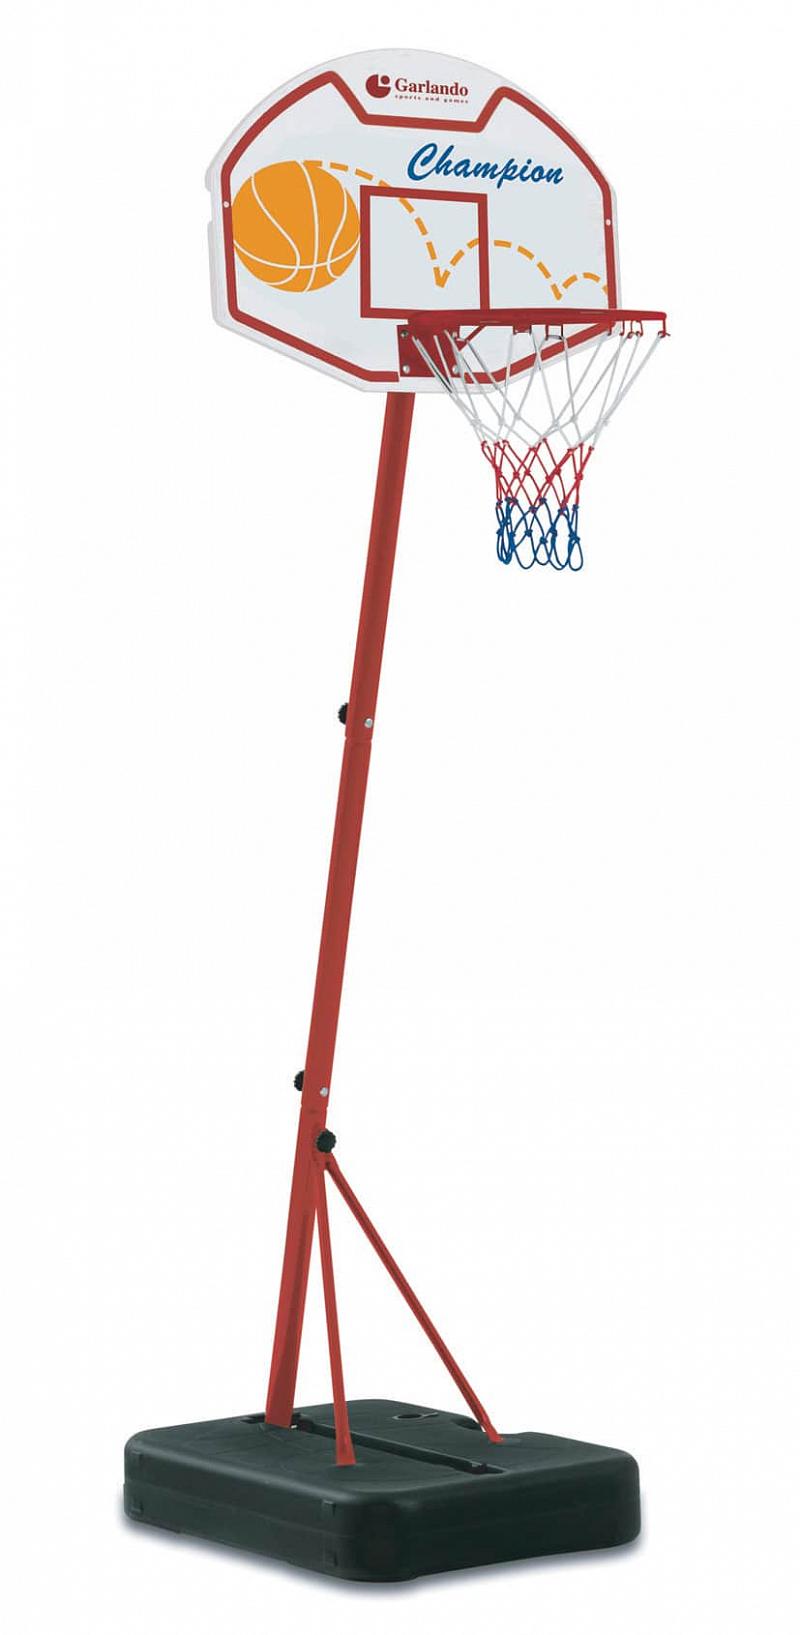 Katalog 2016 Koš basketbalový se stojanem Garlando Phoenix - výška 165cm